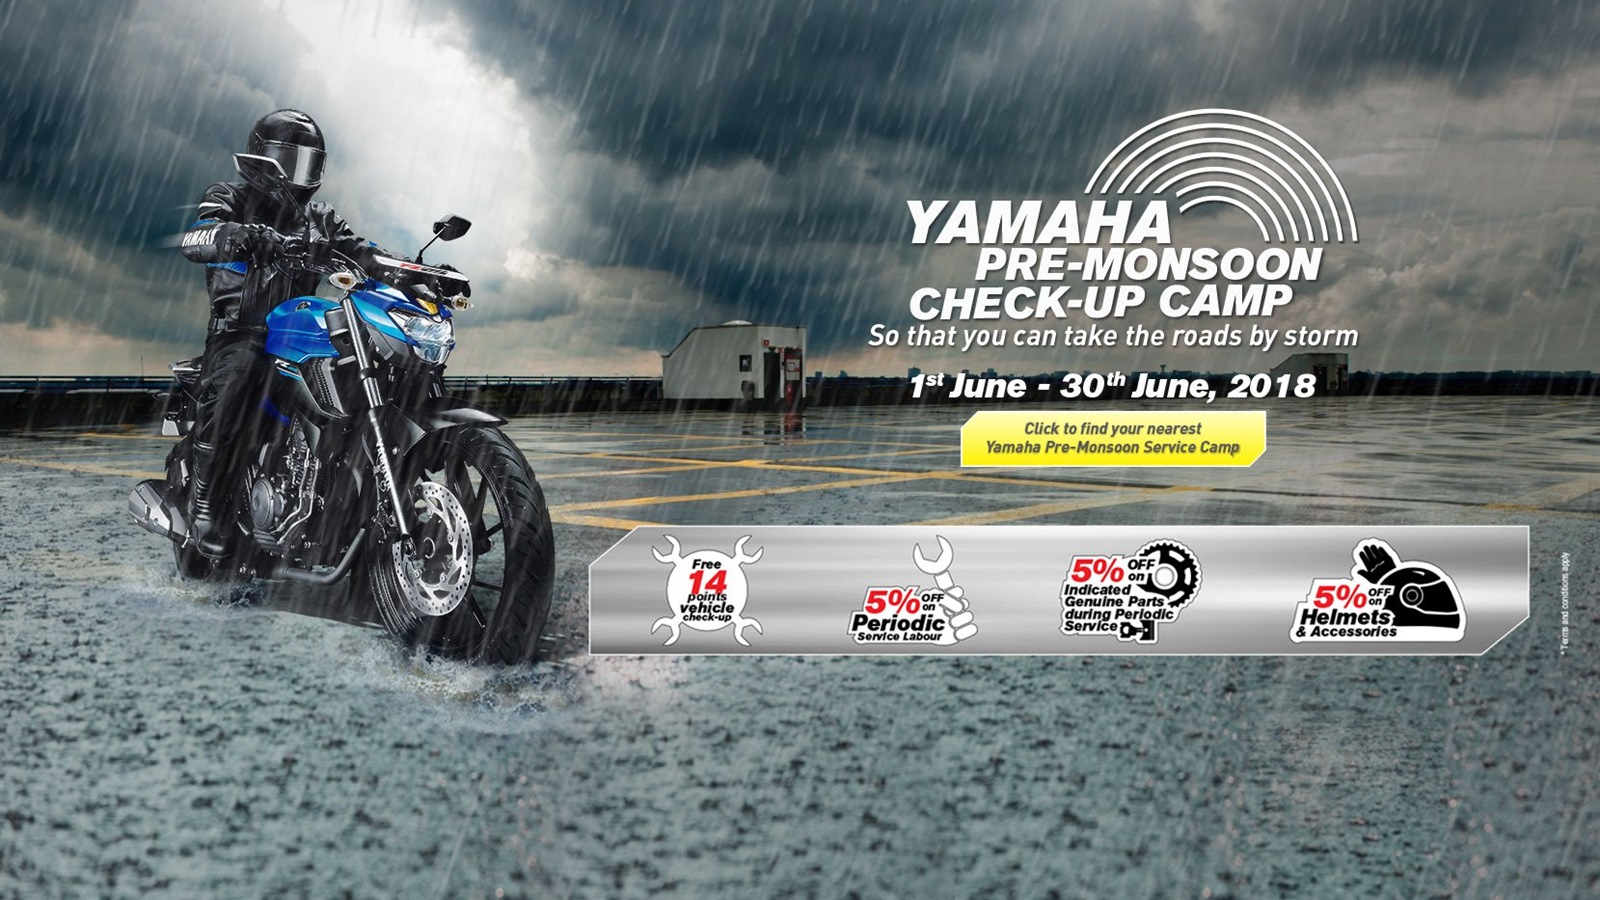 Yamaha organises Pre-Monsoon Check-up Camps